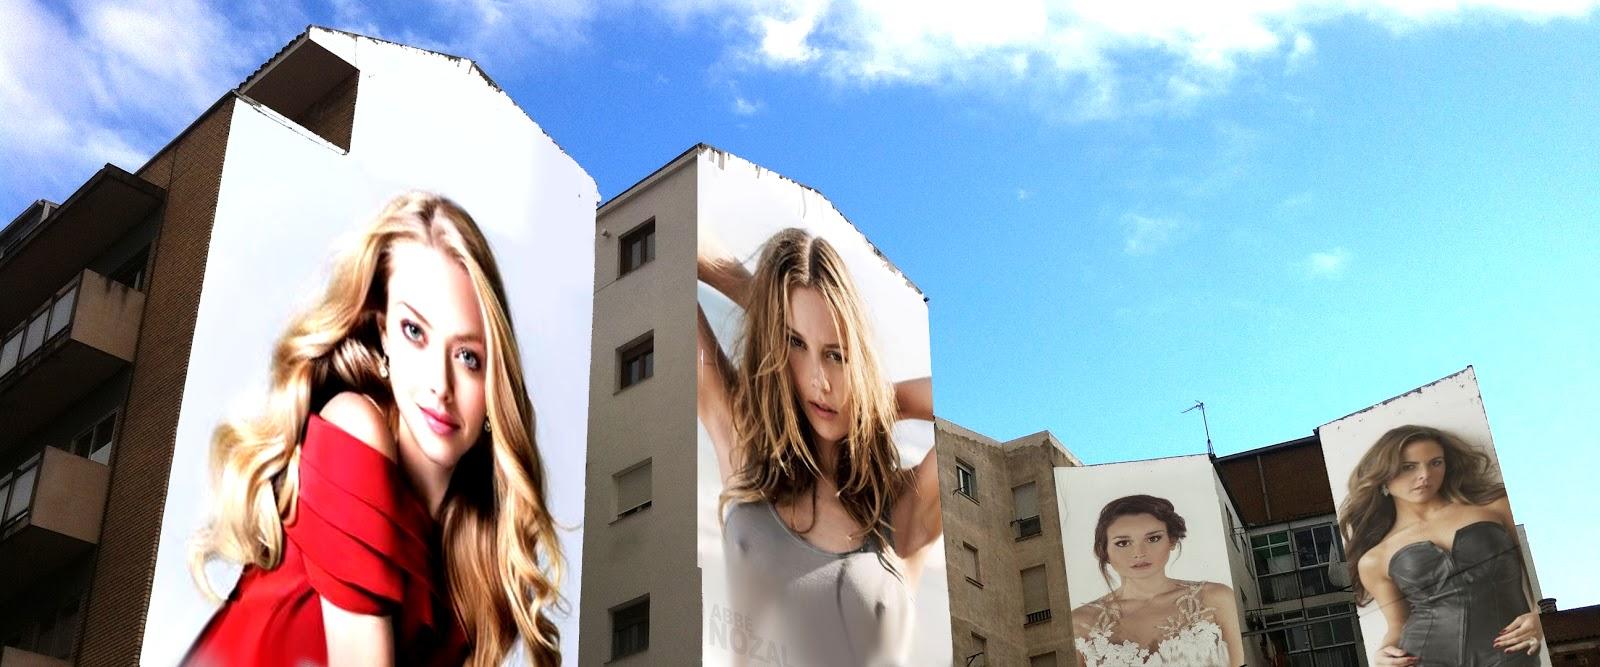 Ellas te miran, 2015 Abbé Nozal